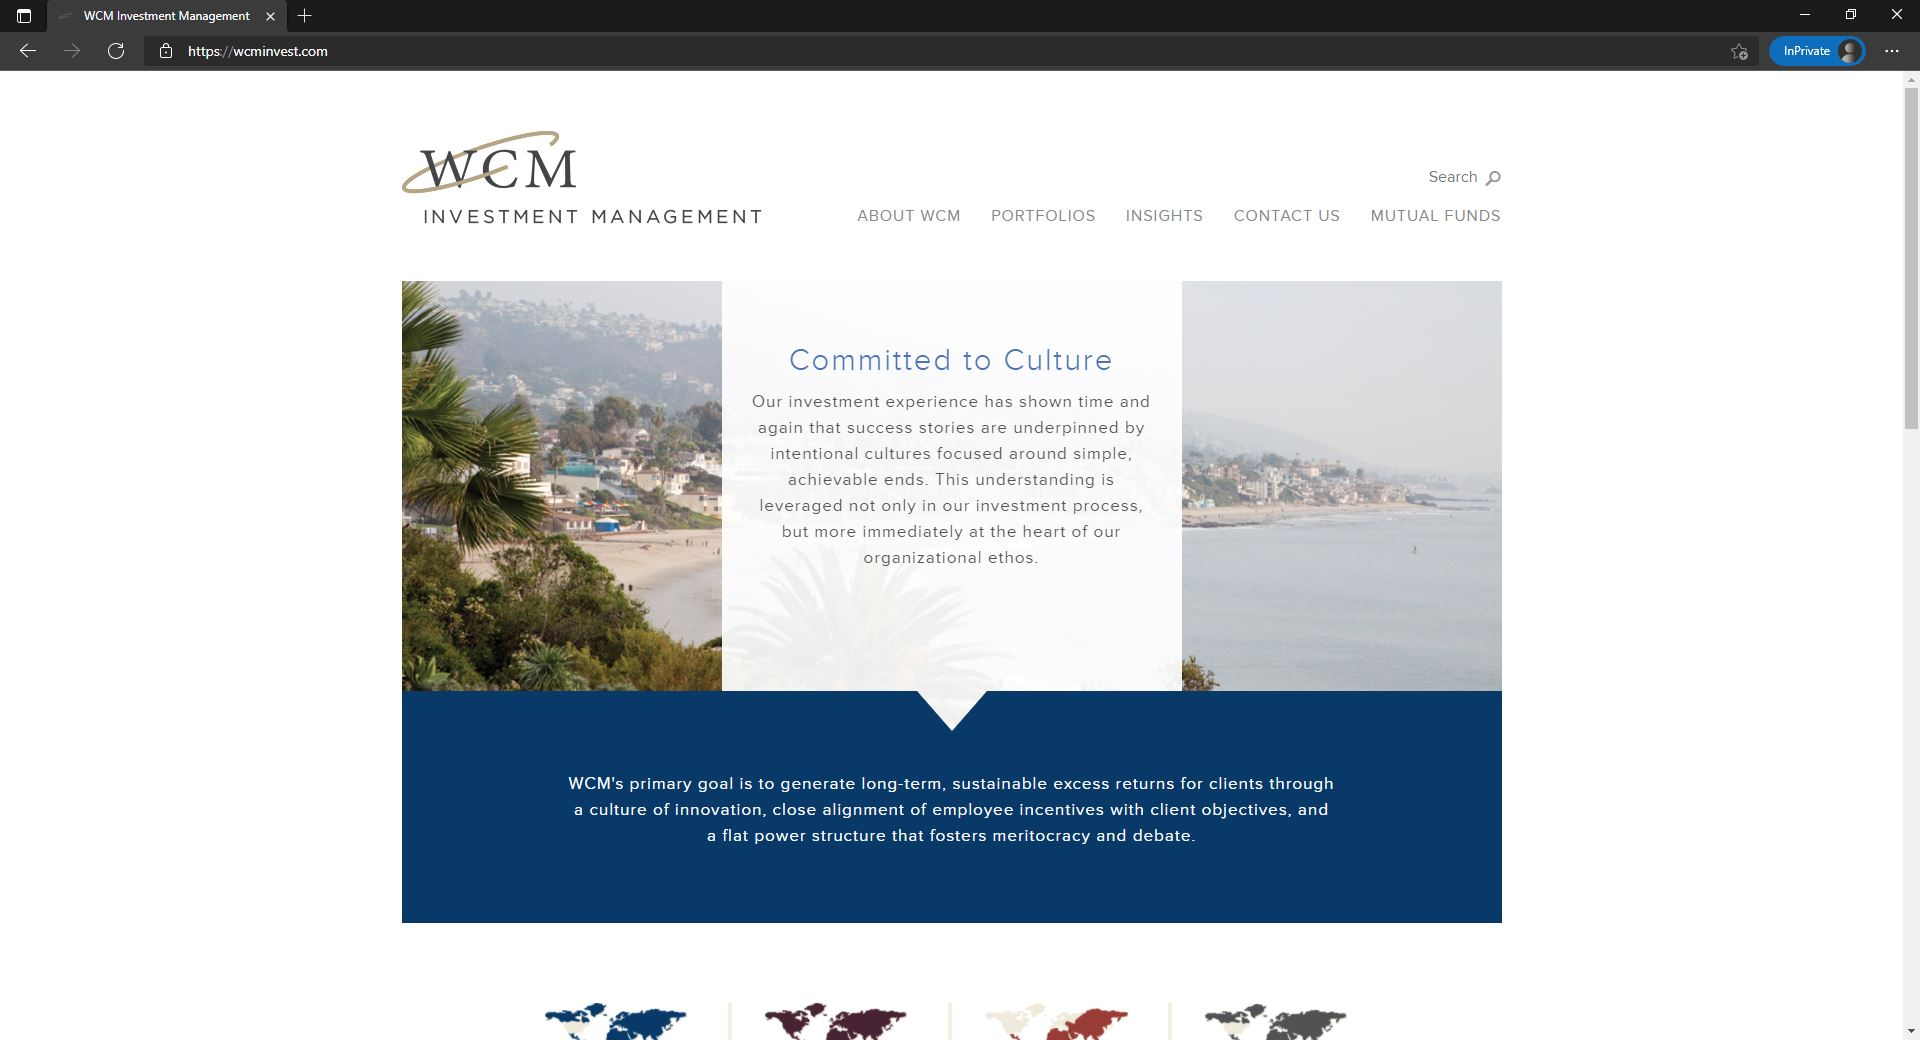 WCM Investment Management website